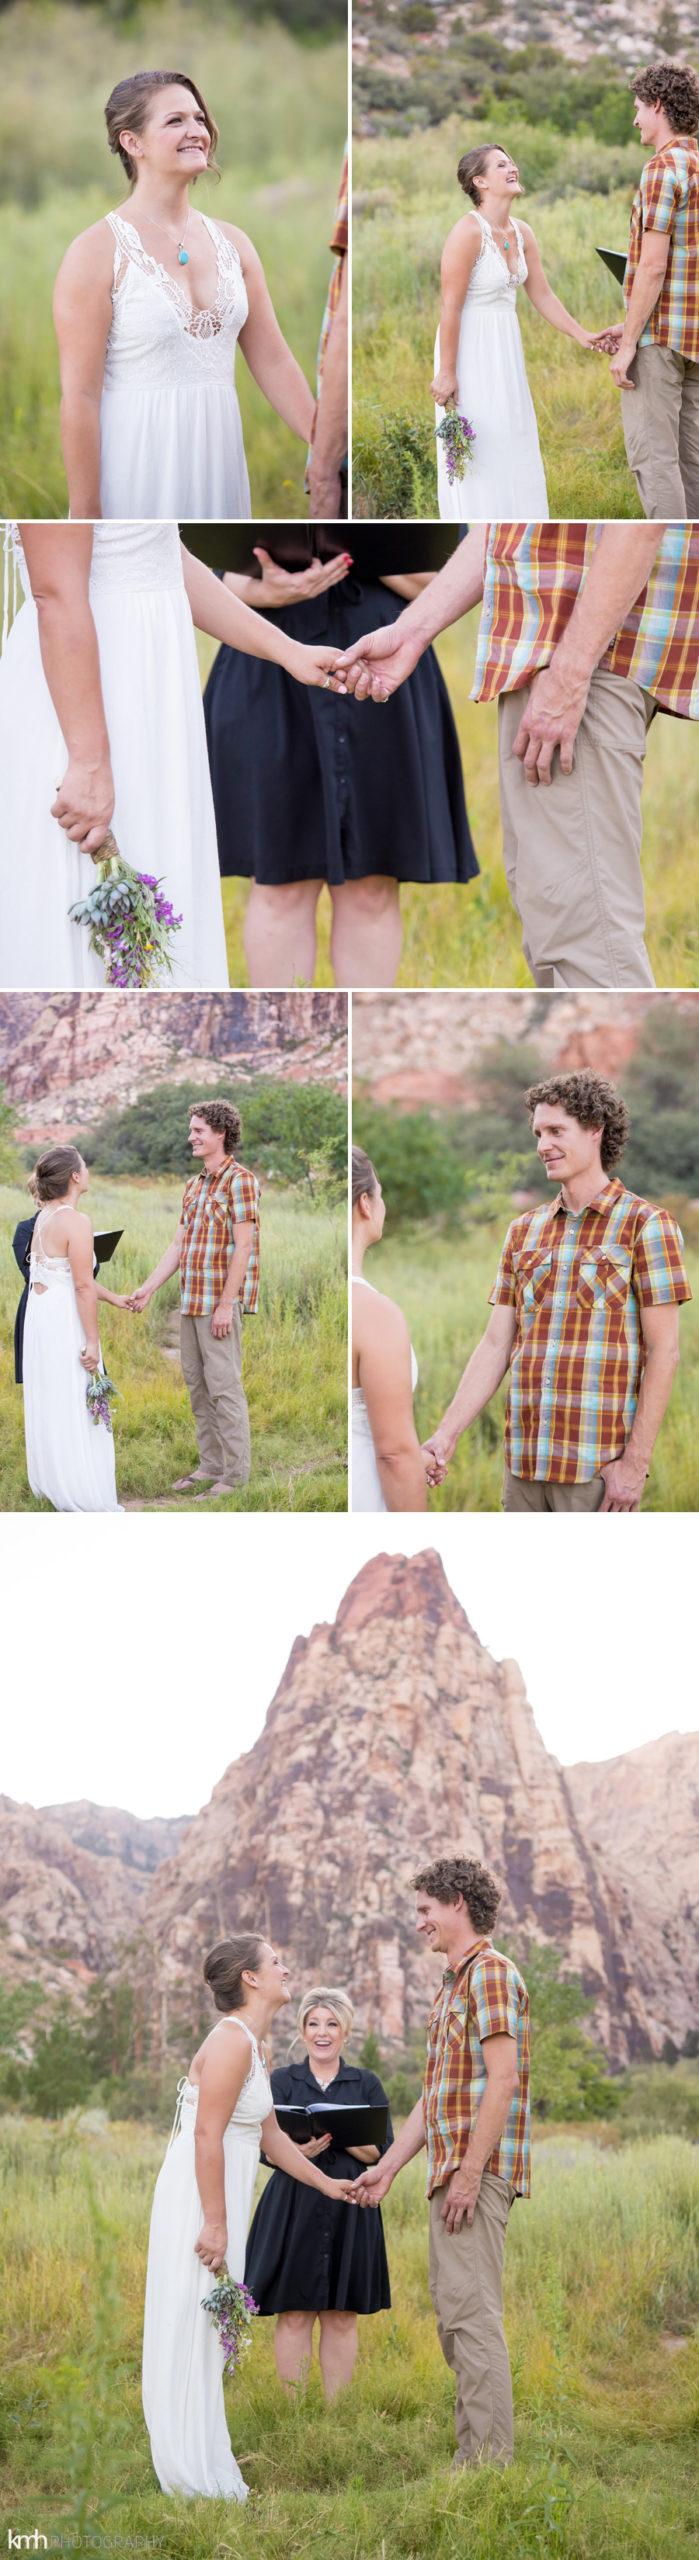 Nevada Desert Elopement | KMH Photography, Las Vegas Wedding Photographer